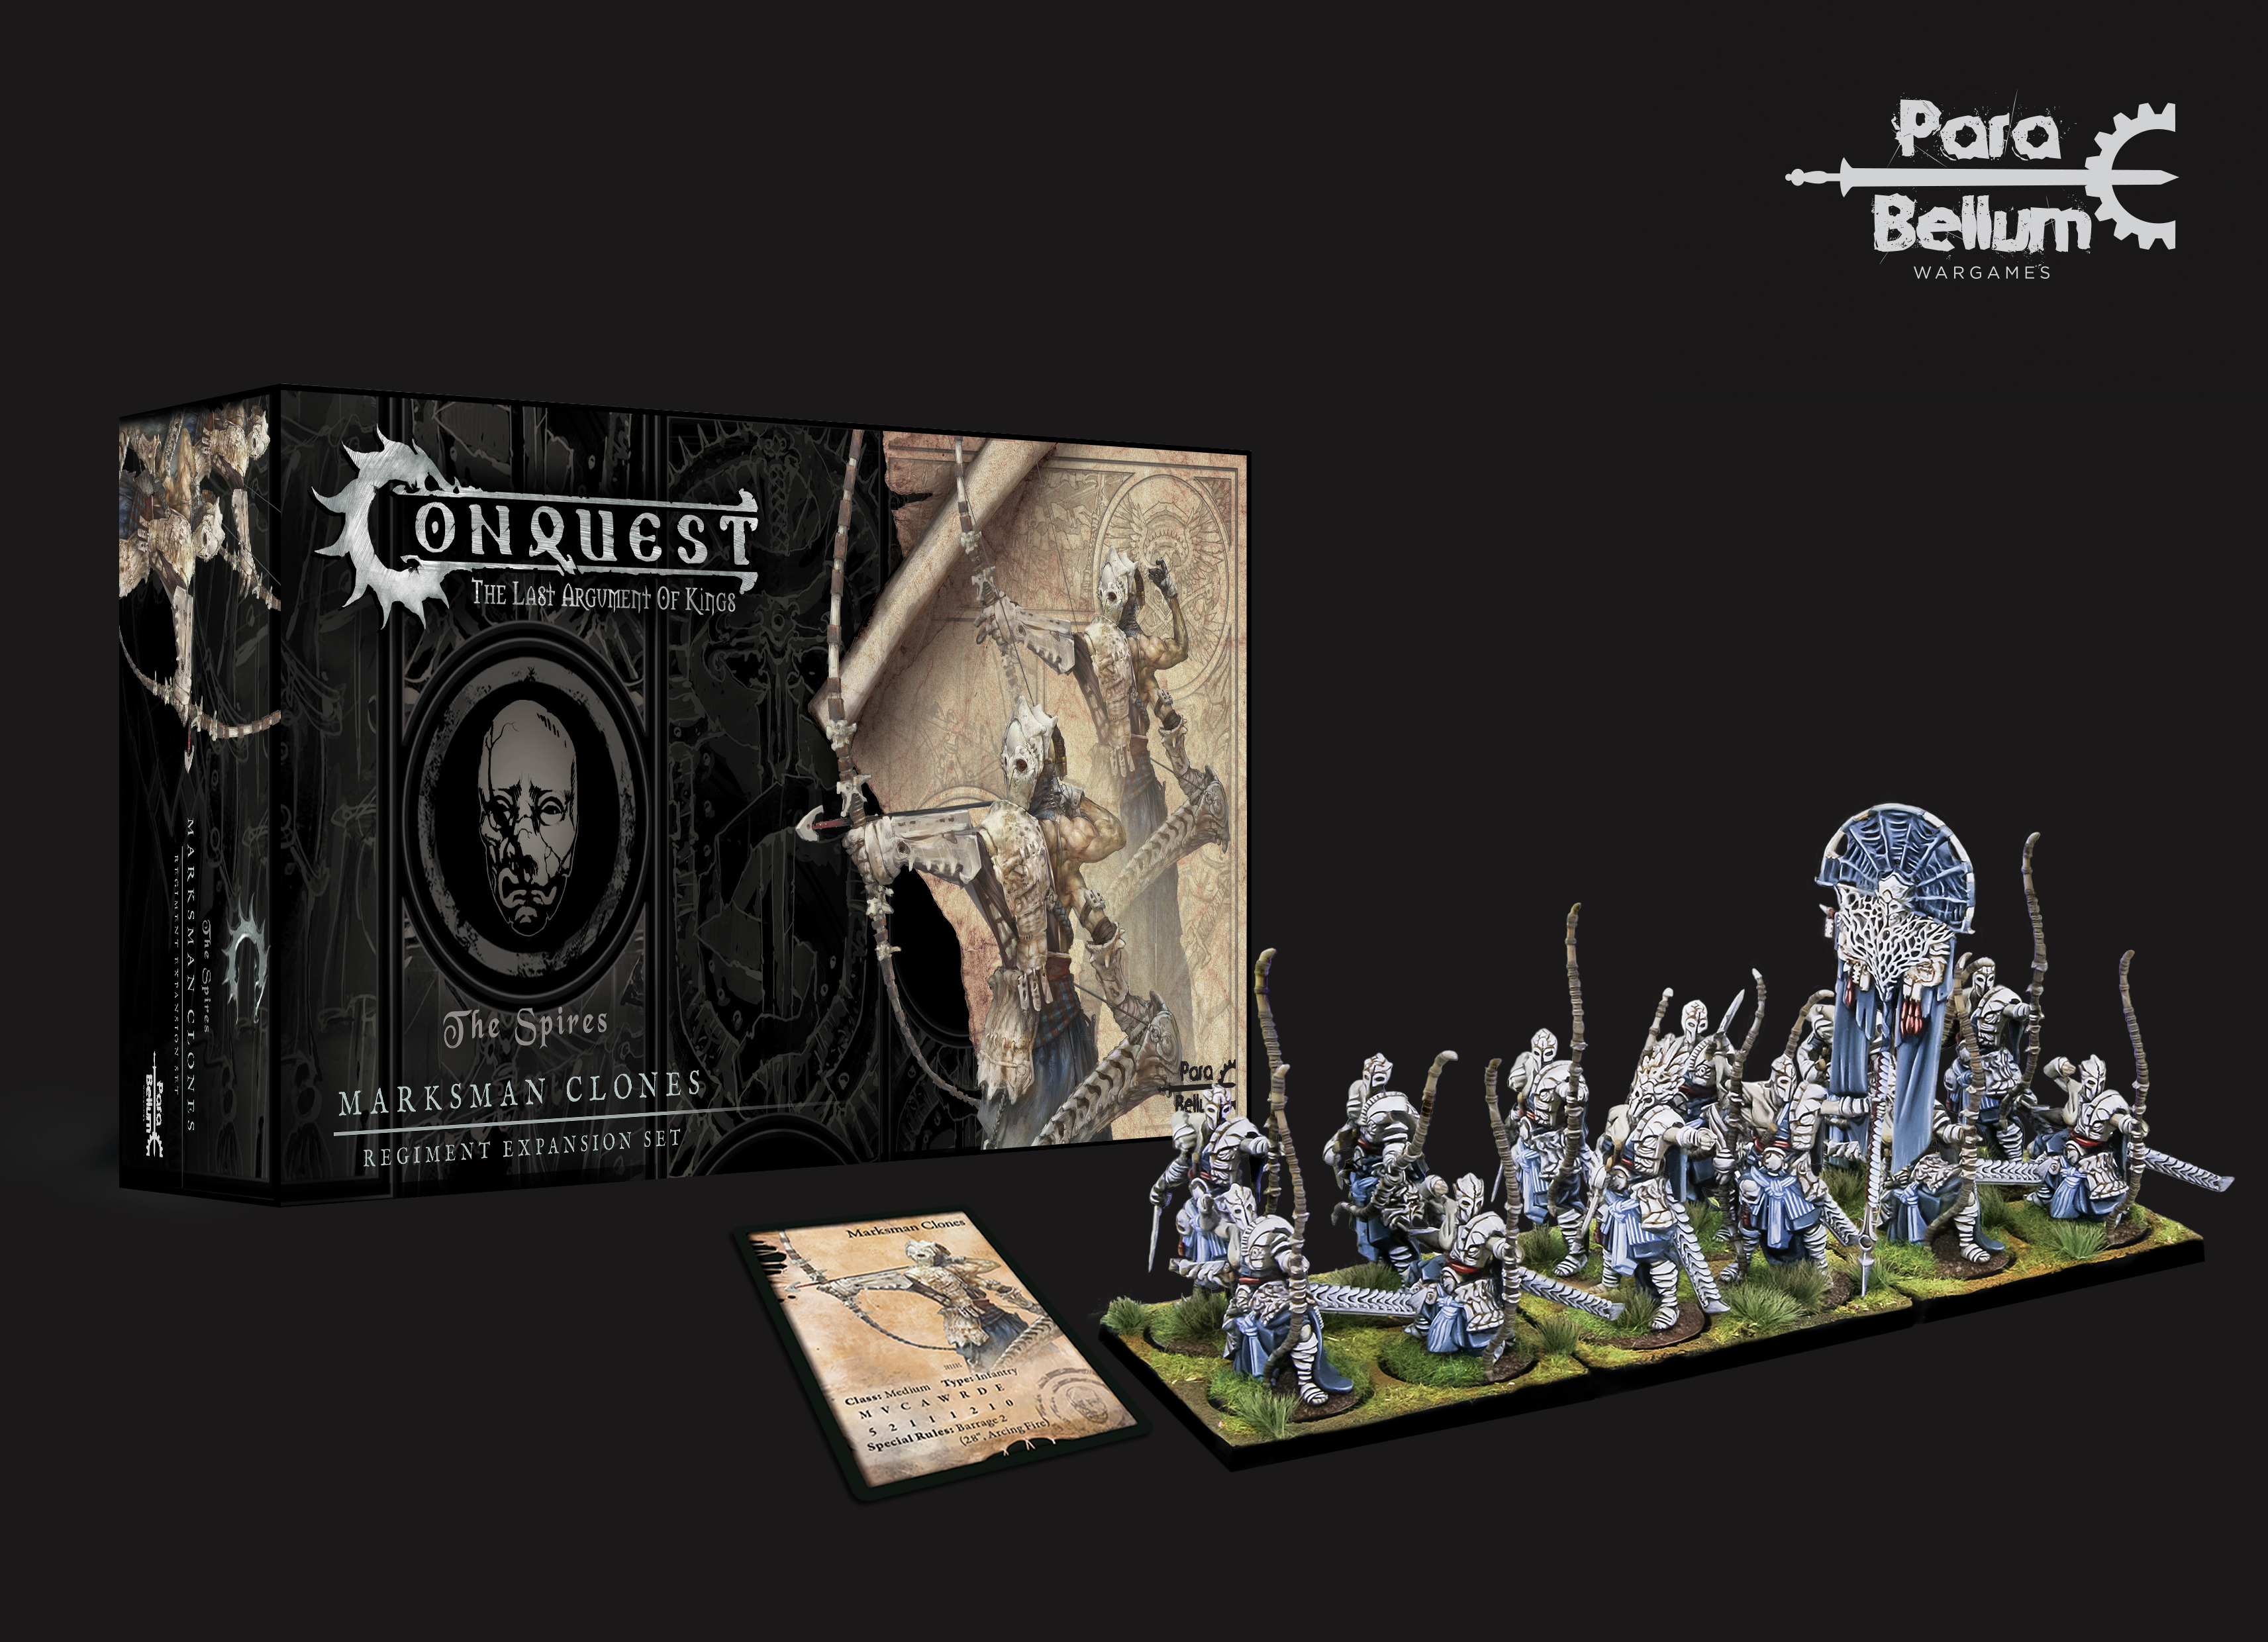 Conquest, Spires - Marksman Clones DEMO Kit (PBW1113)